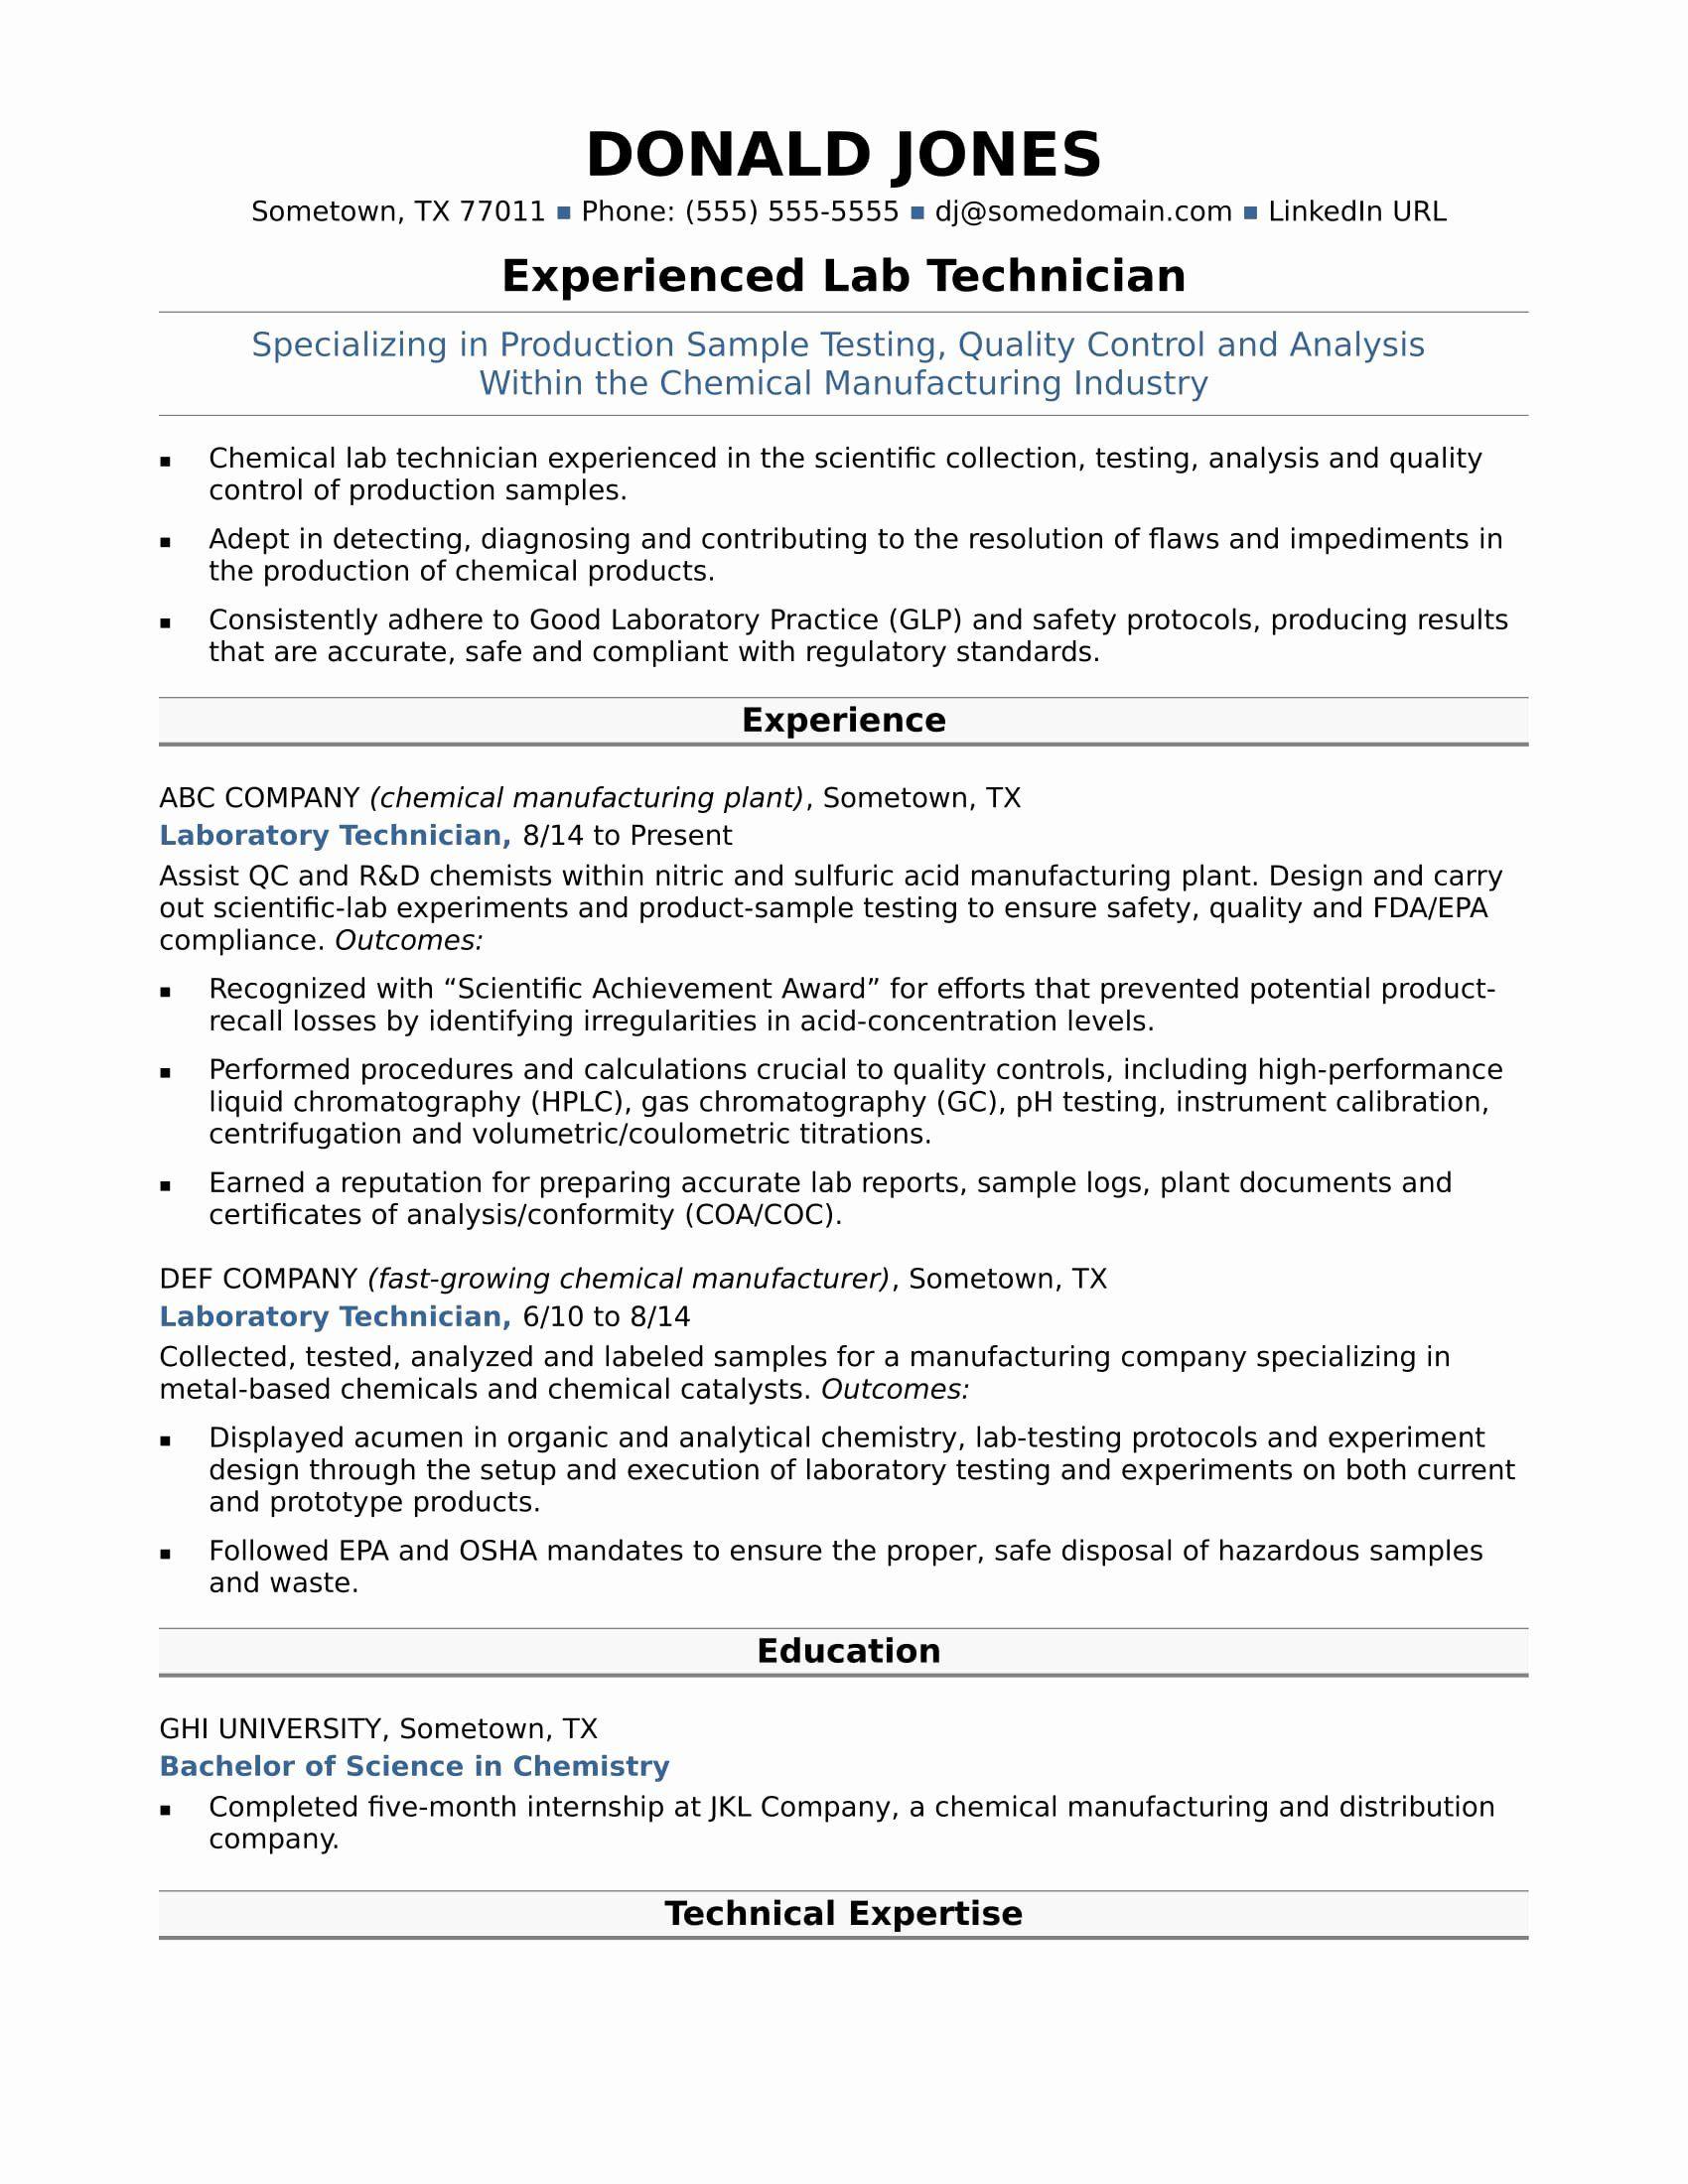 Lab assistant Job Description Resume Fresh Midlevel Lab